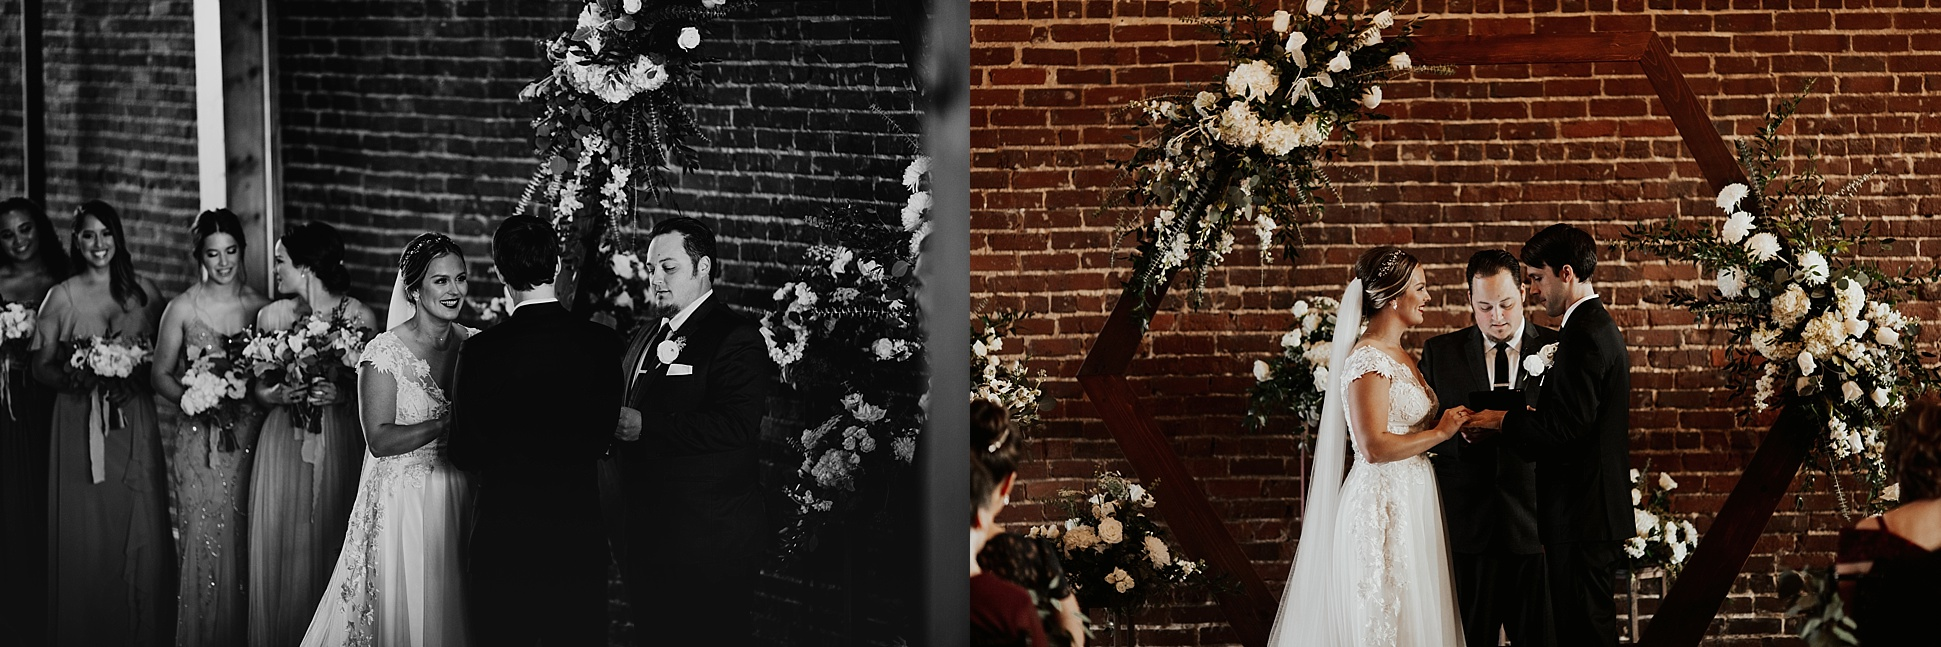 terminus_330_wedding_atlanta048.JPG